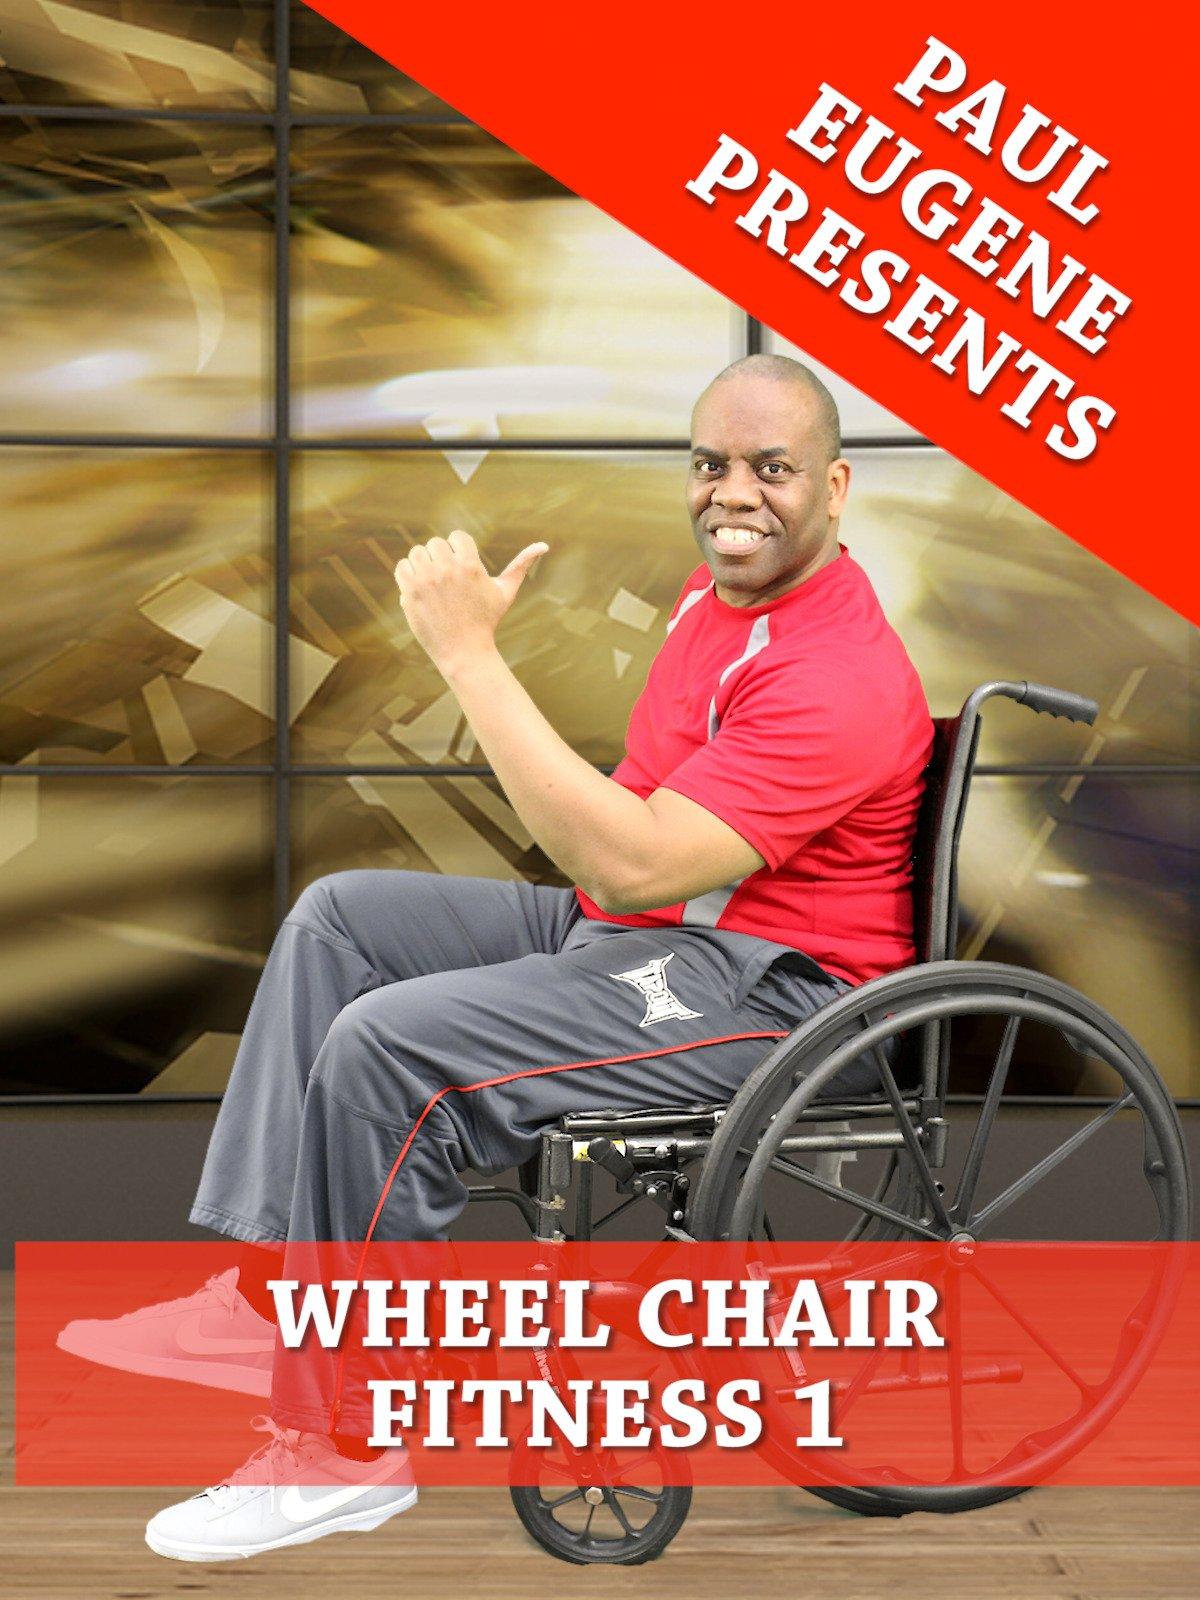 Wheel Chair Fitness 1